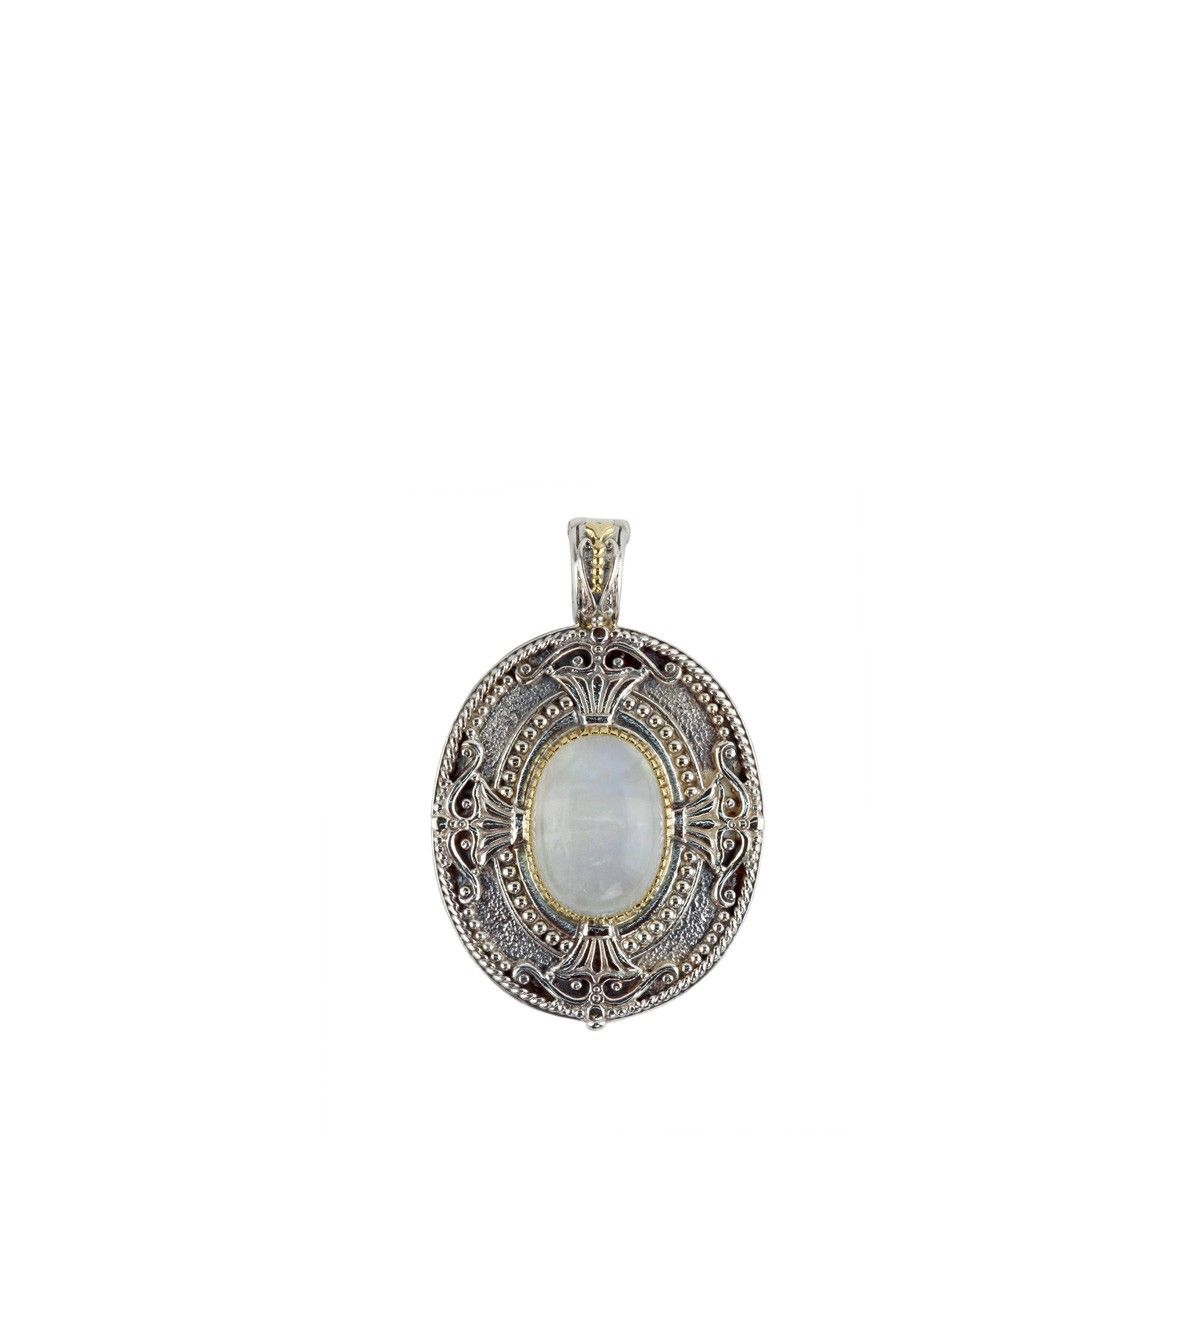 Pin by allison fuqua on wish list pinterest oval frame stone